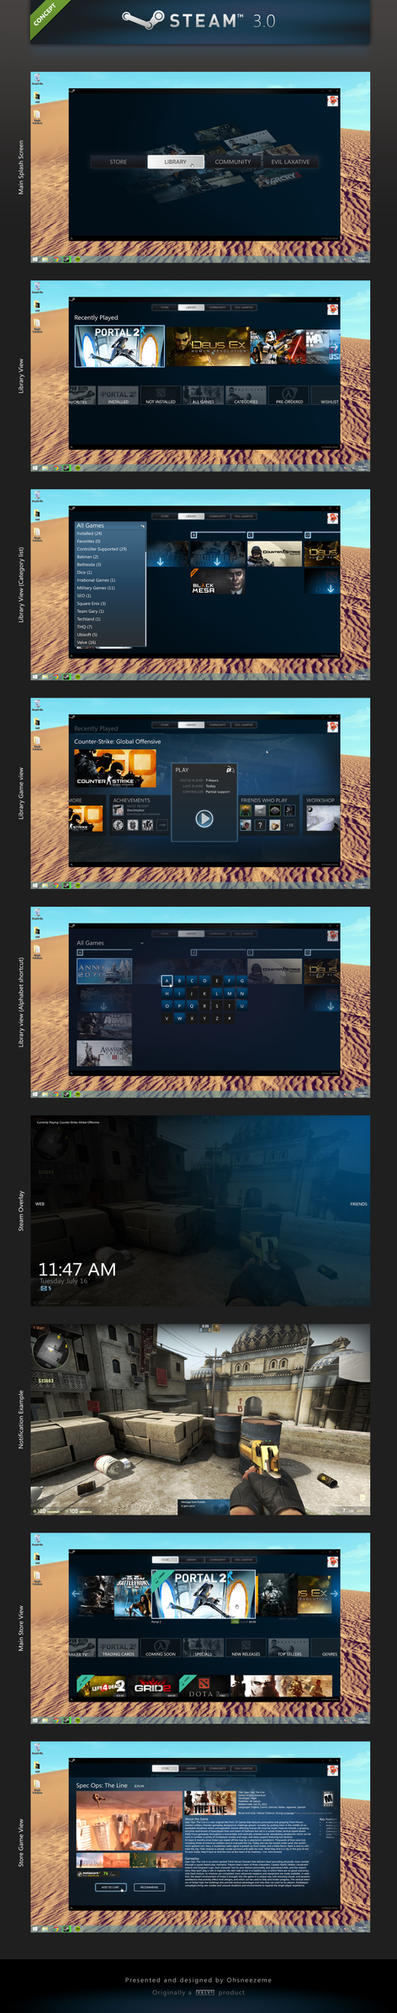 Steam 3.0 (Concept) by Ohsneezeme